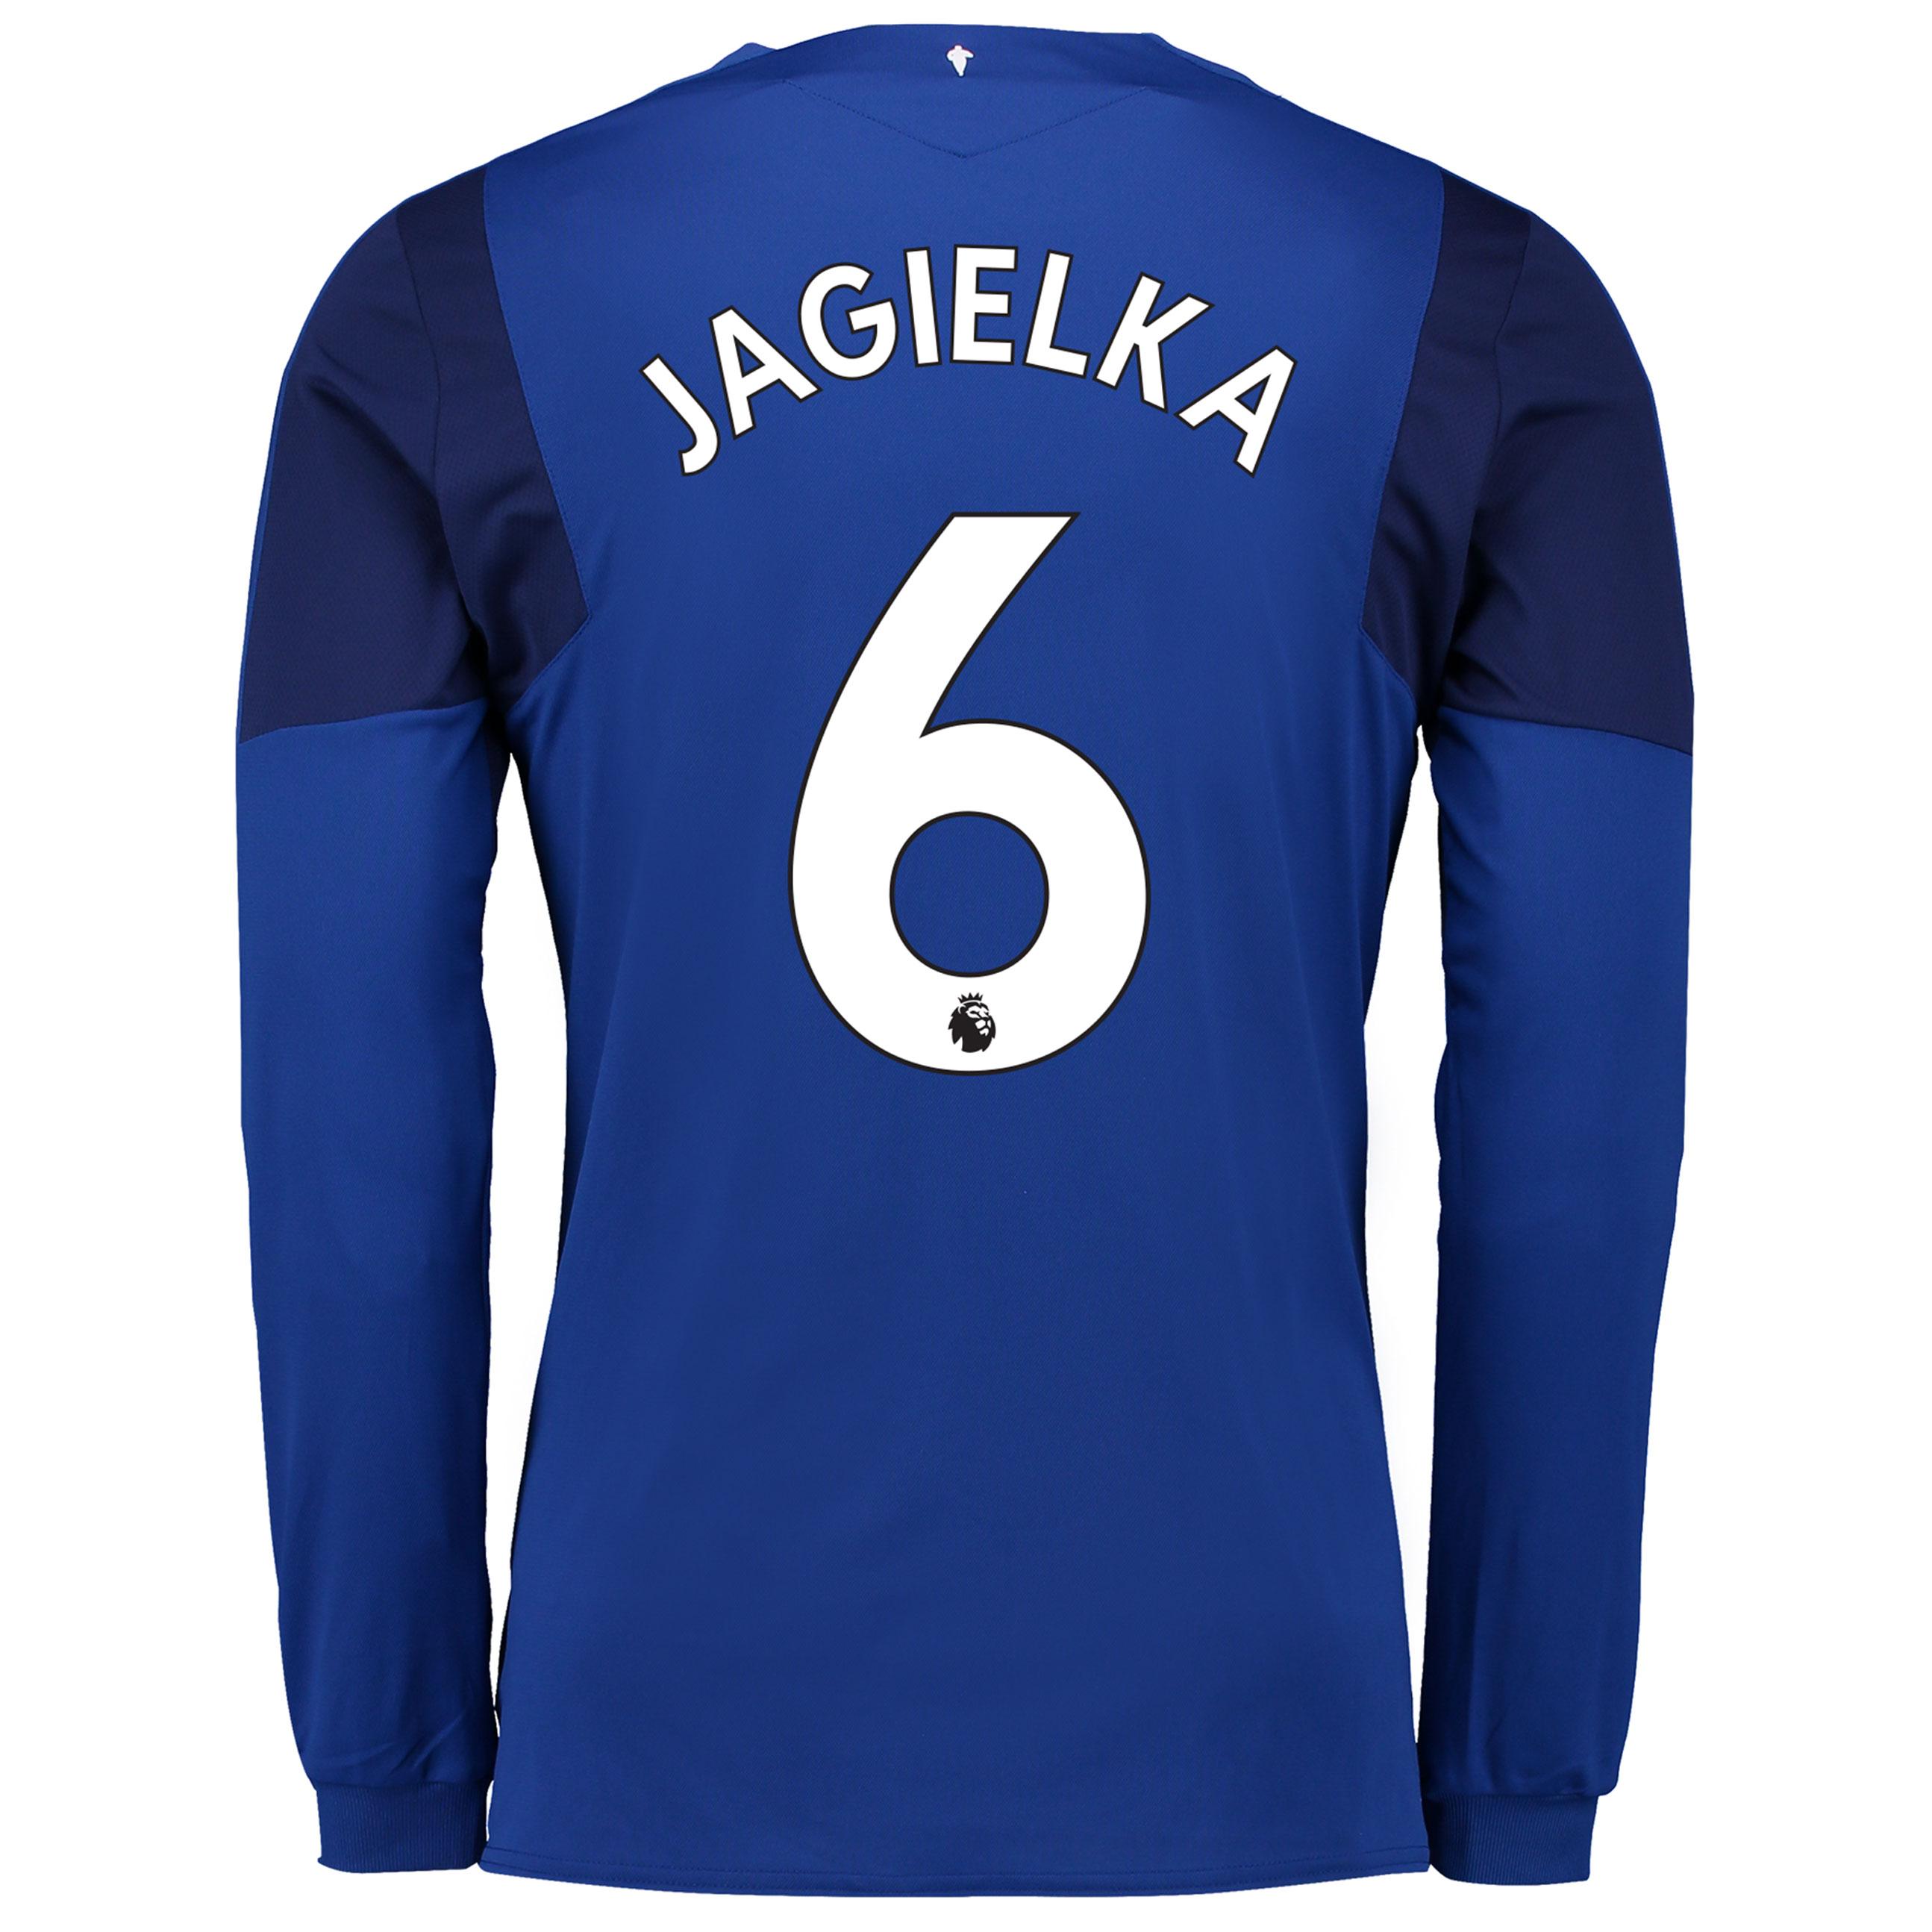 Everton Home Shirt 2017/18 - Long Sleeved with Jagielka 6 printing